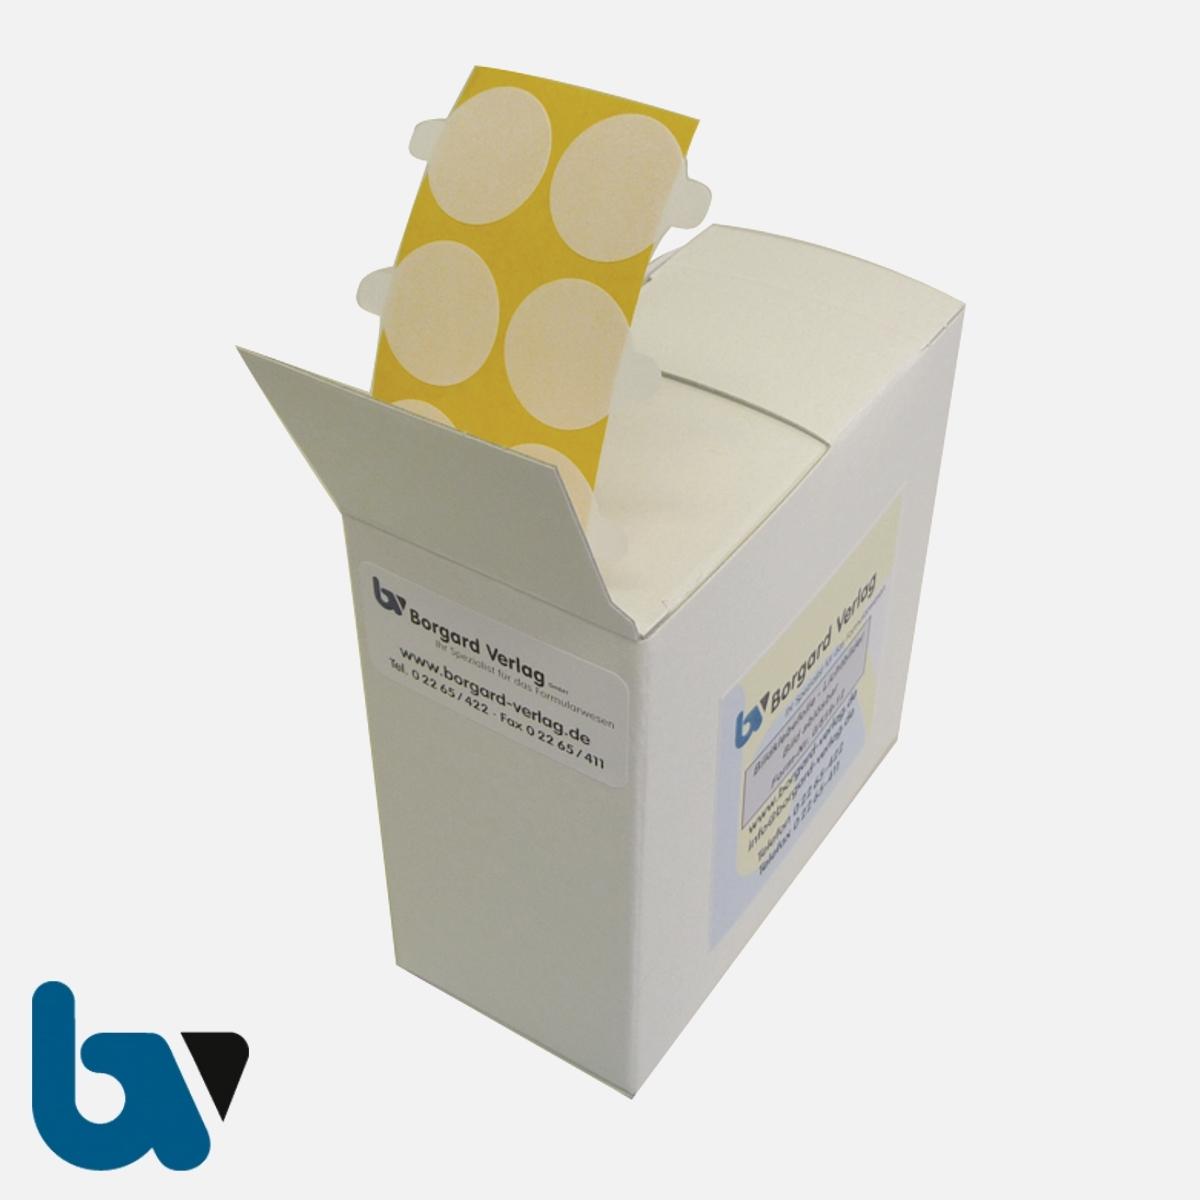 0/519-12 Bildklebefolie Spenderbox ablösbar Antragsverfahren Personalausweis | Borgard Verlag GmbH